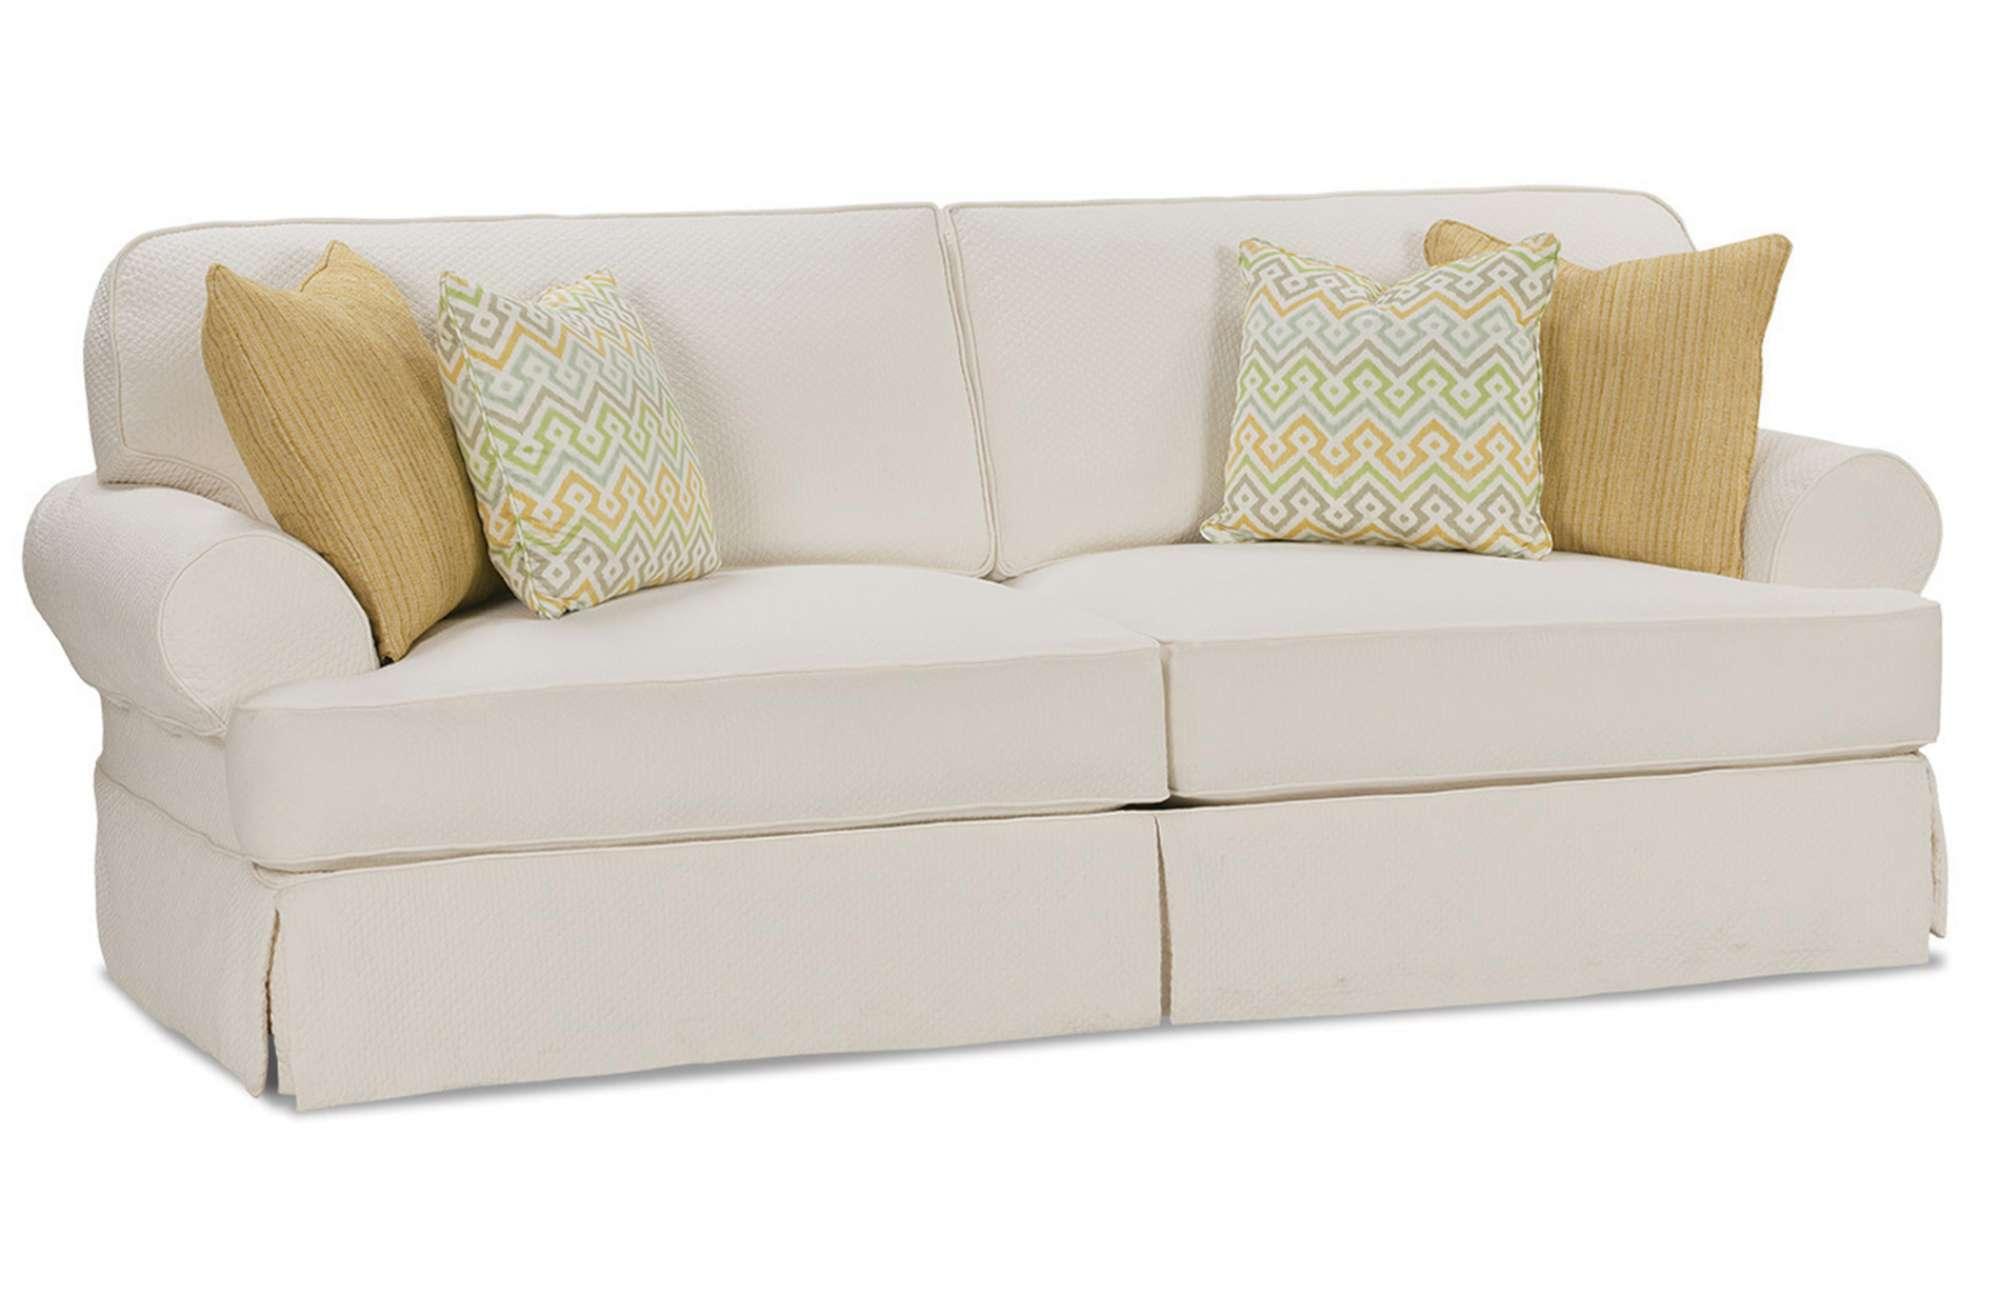 sleeper sofa covers photo - 4